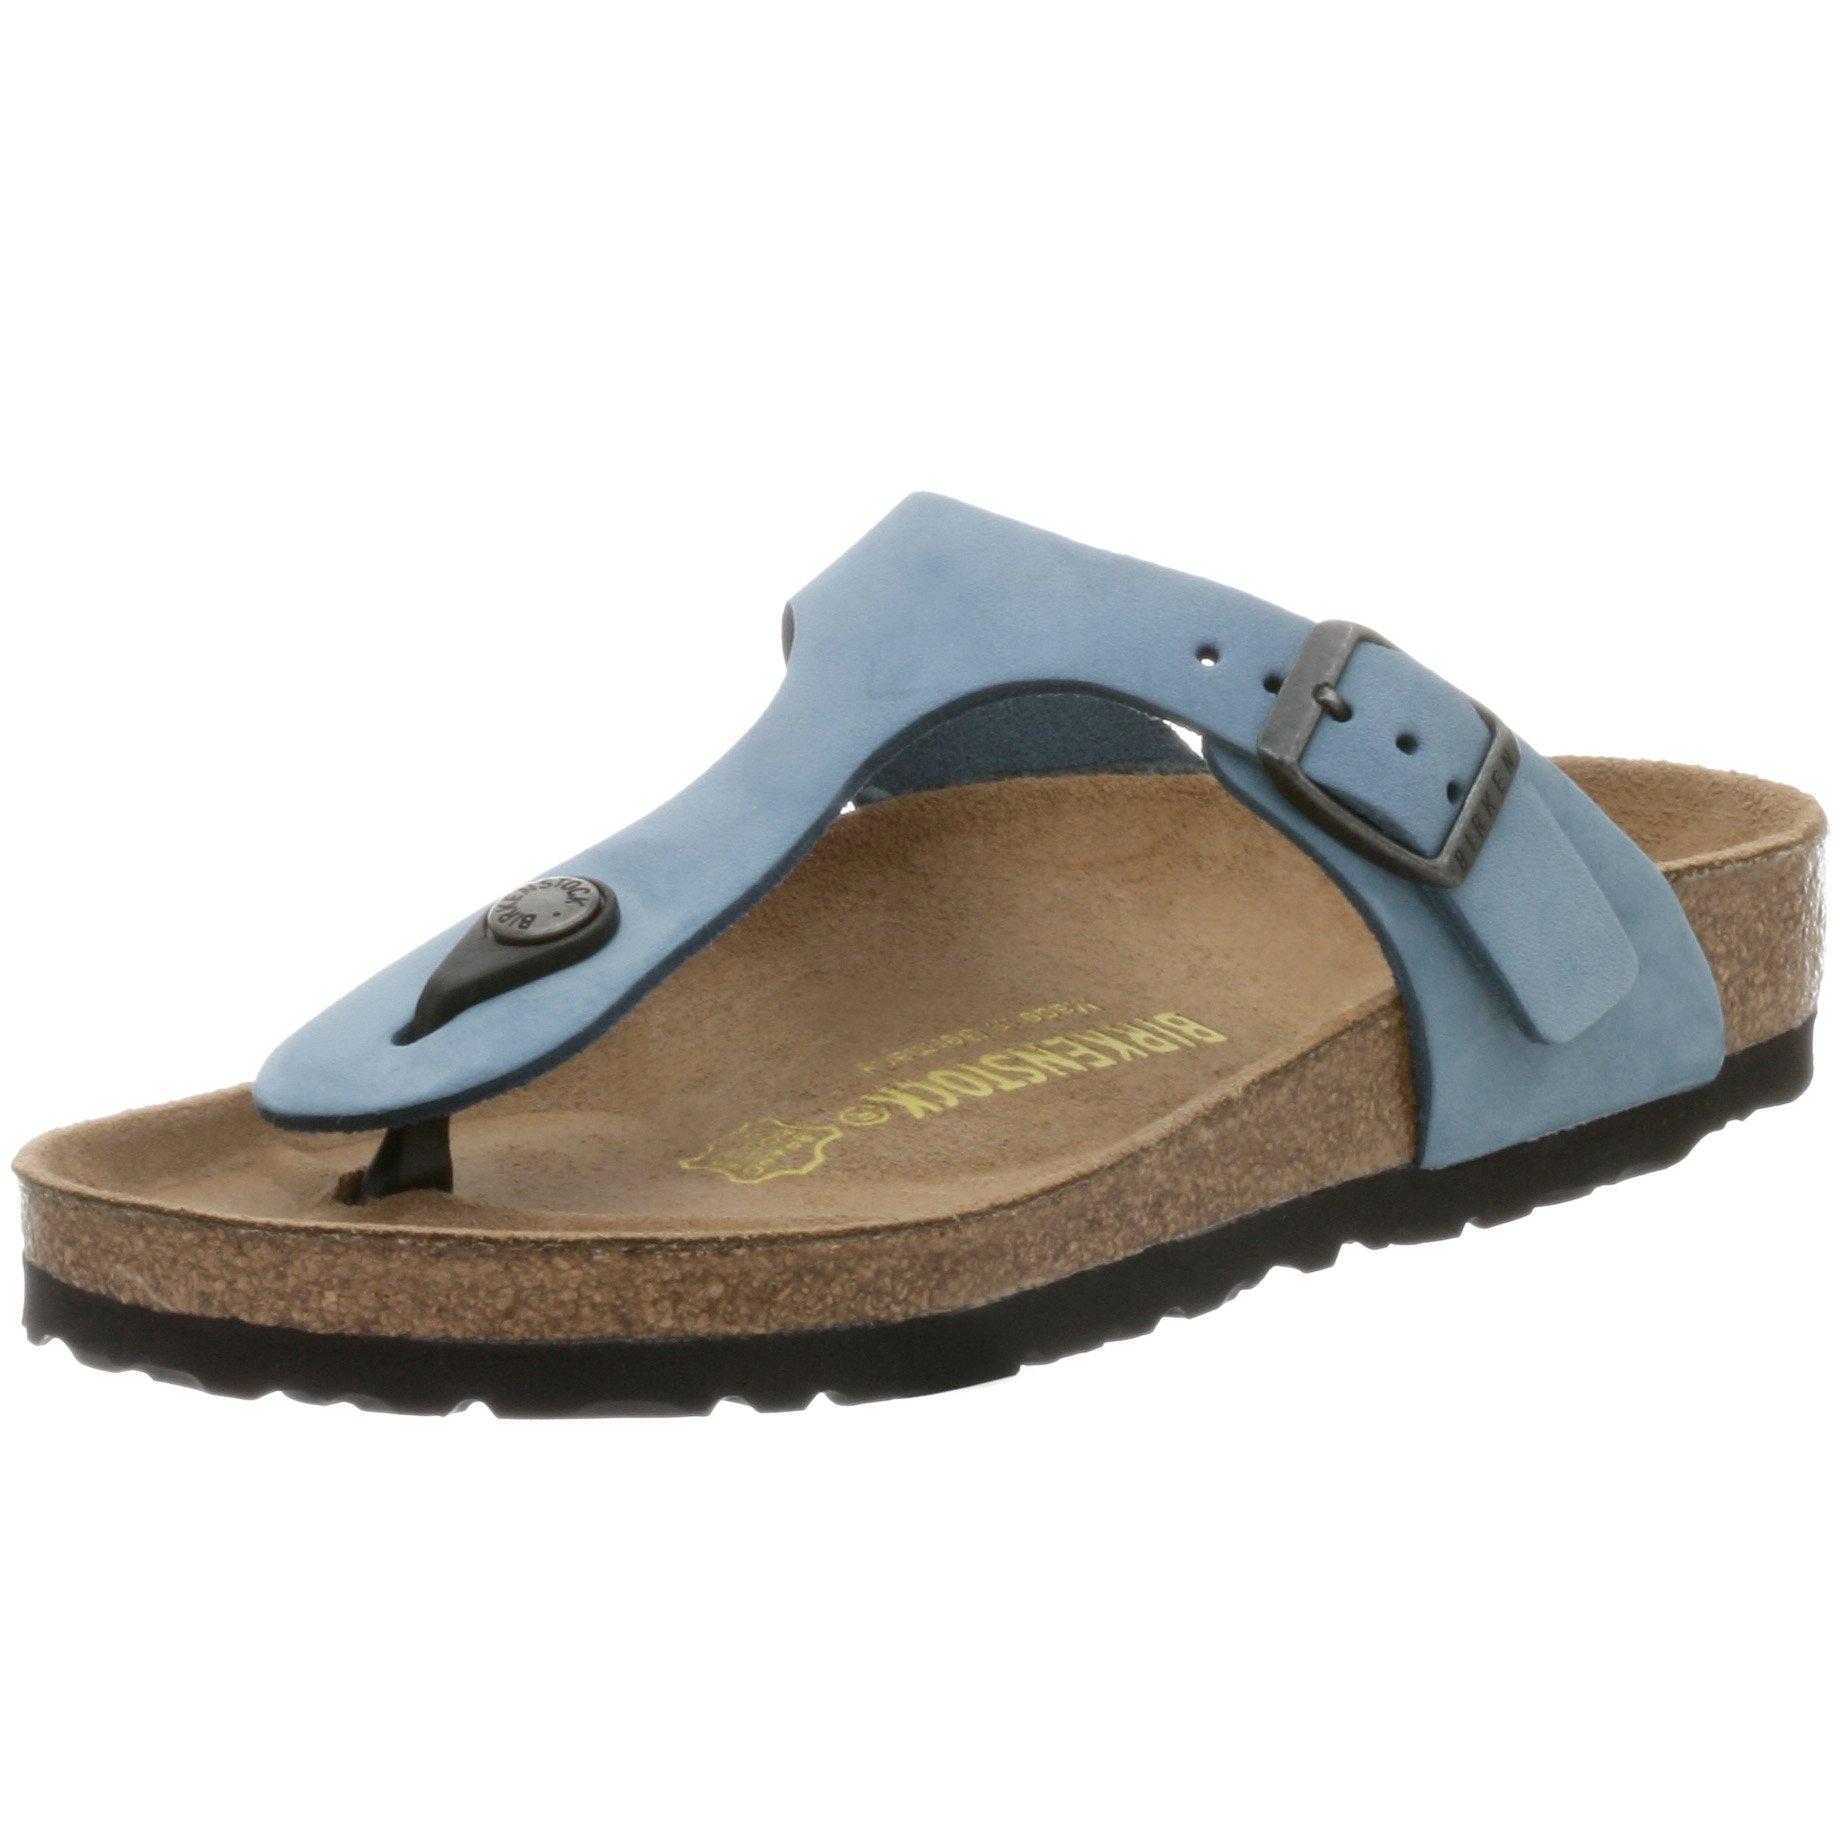 3927699fa045 Galleon - Birkenstock Women s GIzeh Thong Sandal